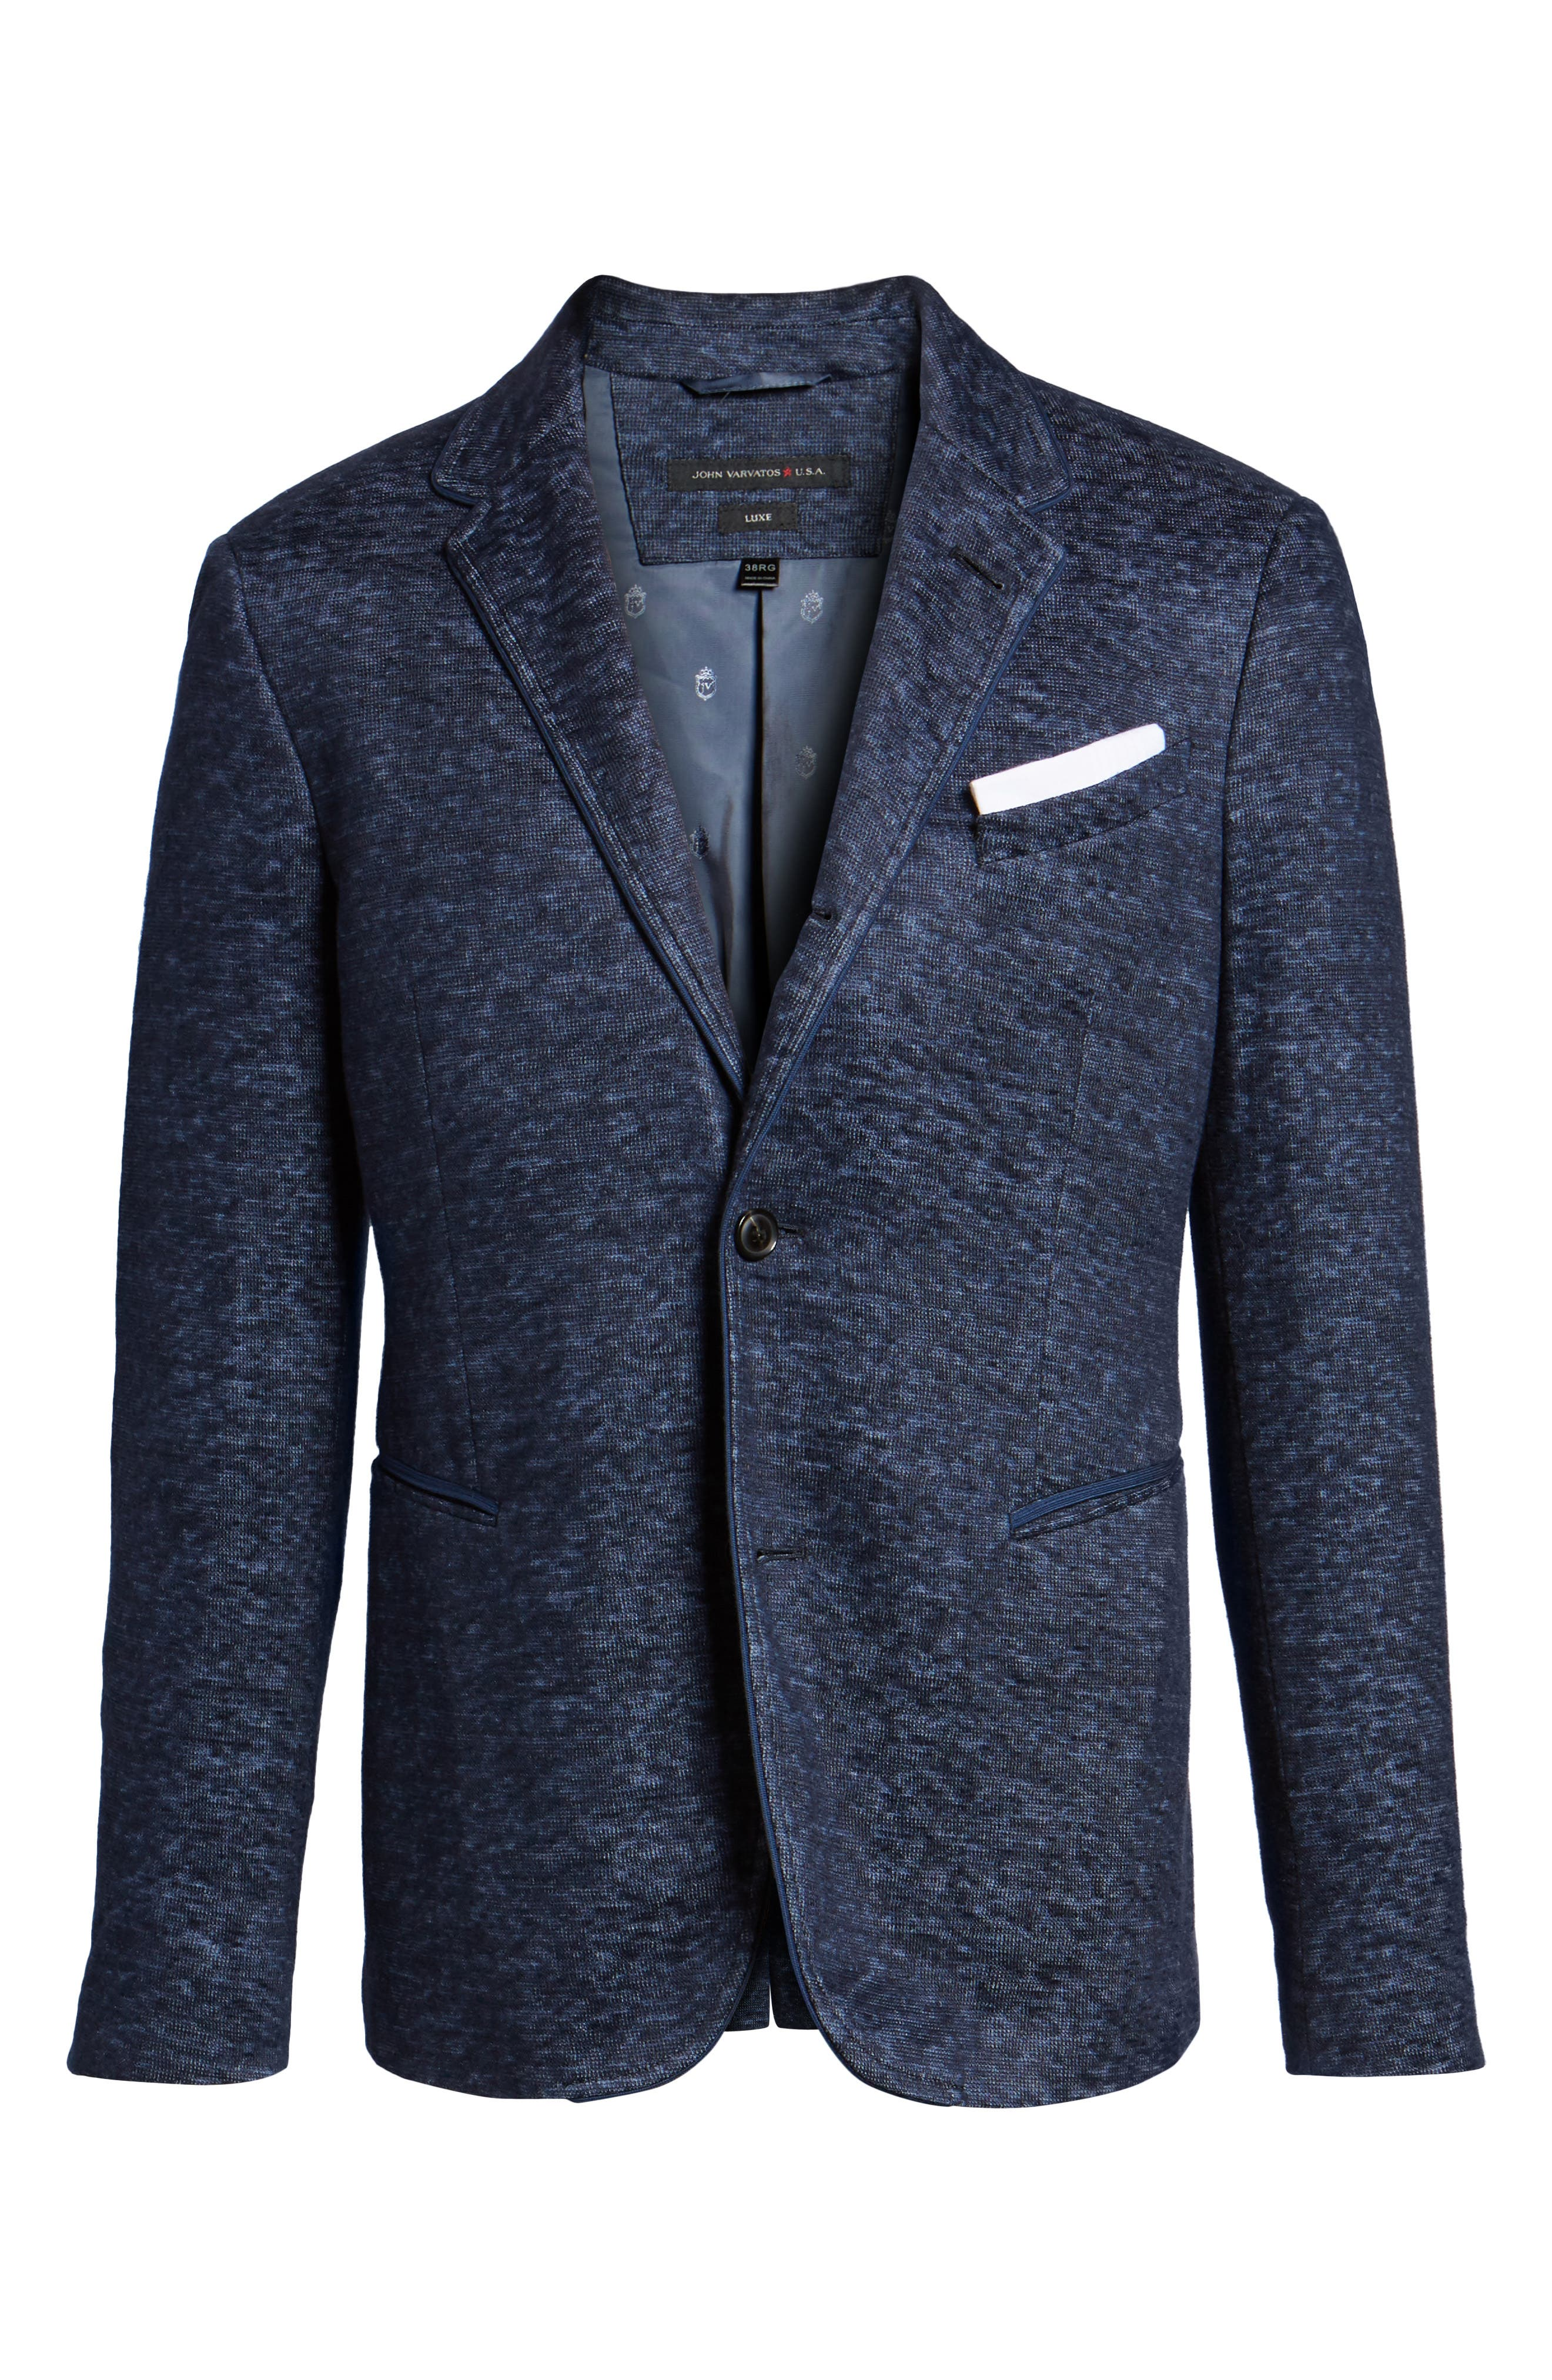 Regular Fit Cotton & Linen Blazer,                             Alternate thumbnail 5, color,                             406